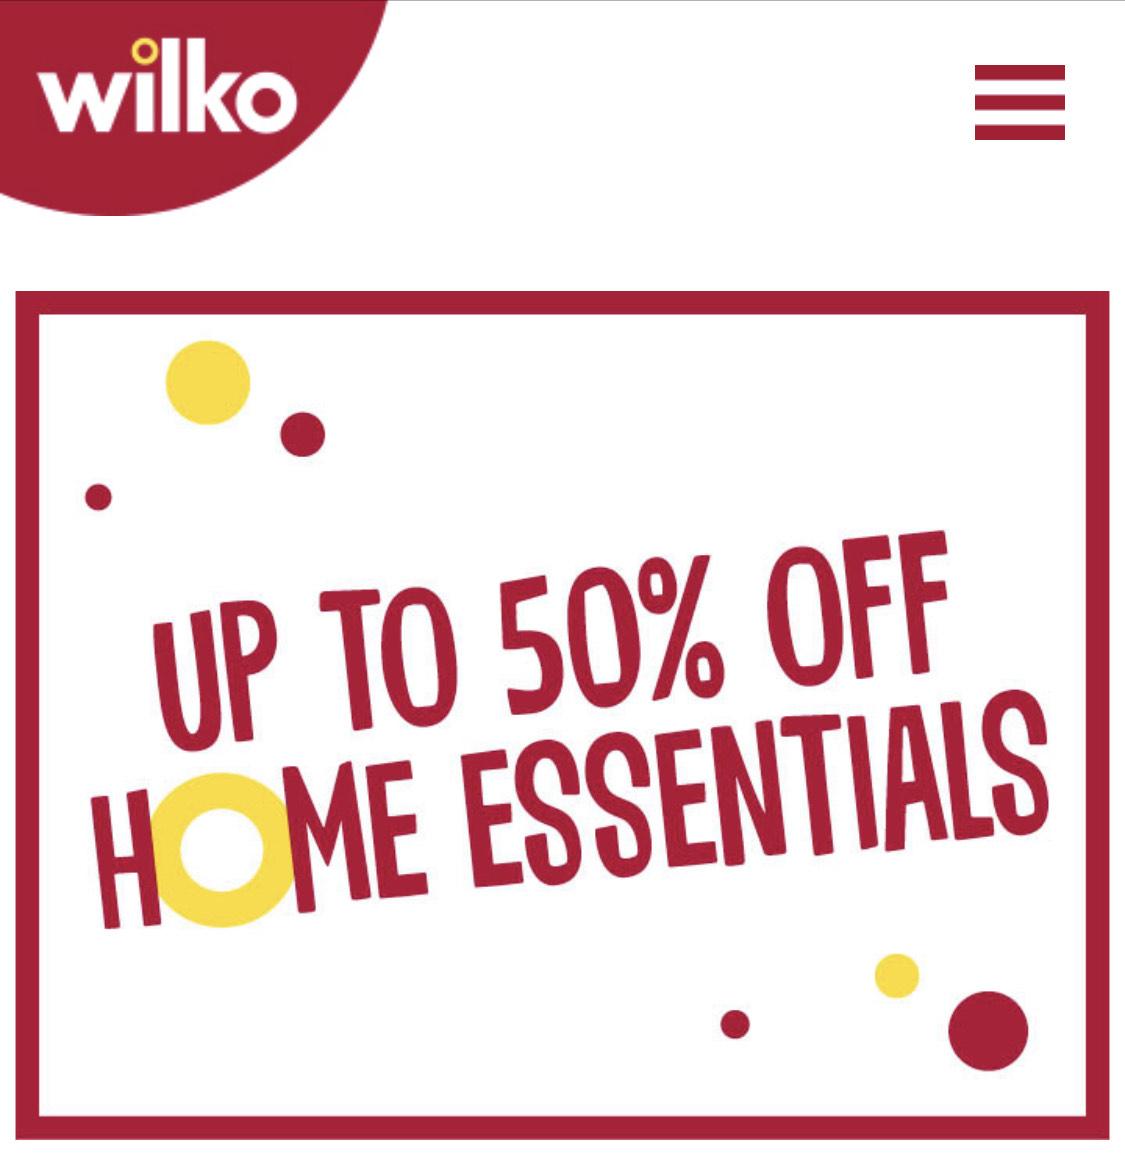 WILKO up to 50% of home essentials